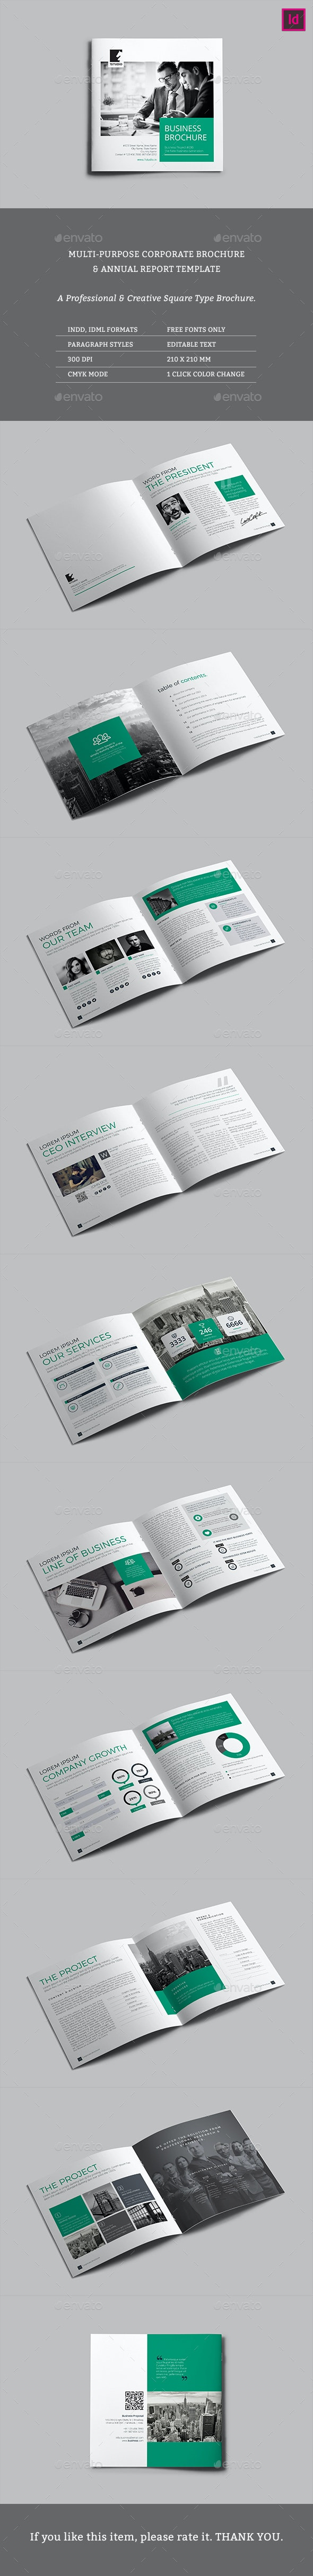 Square Access Multipurpose Brochure - Corporate Brochures